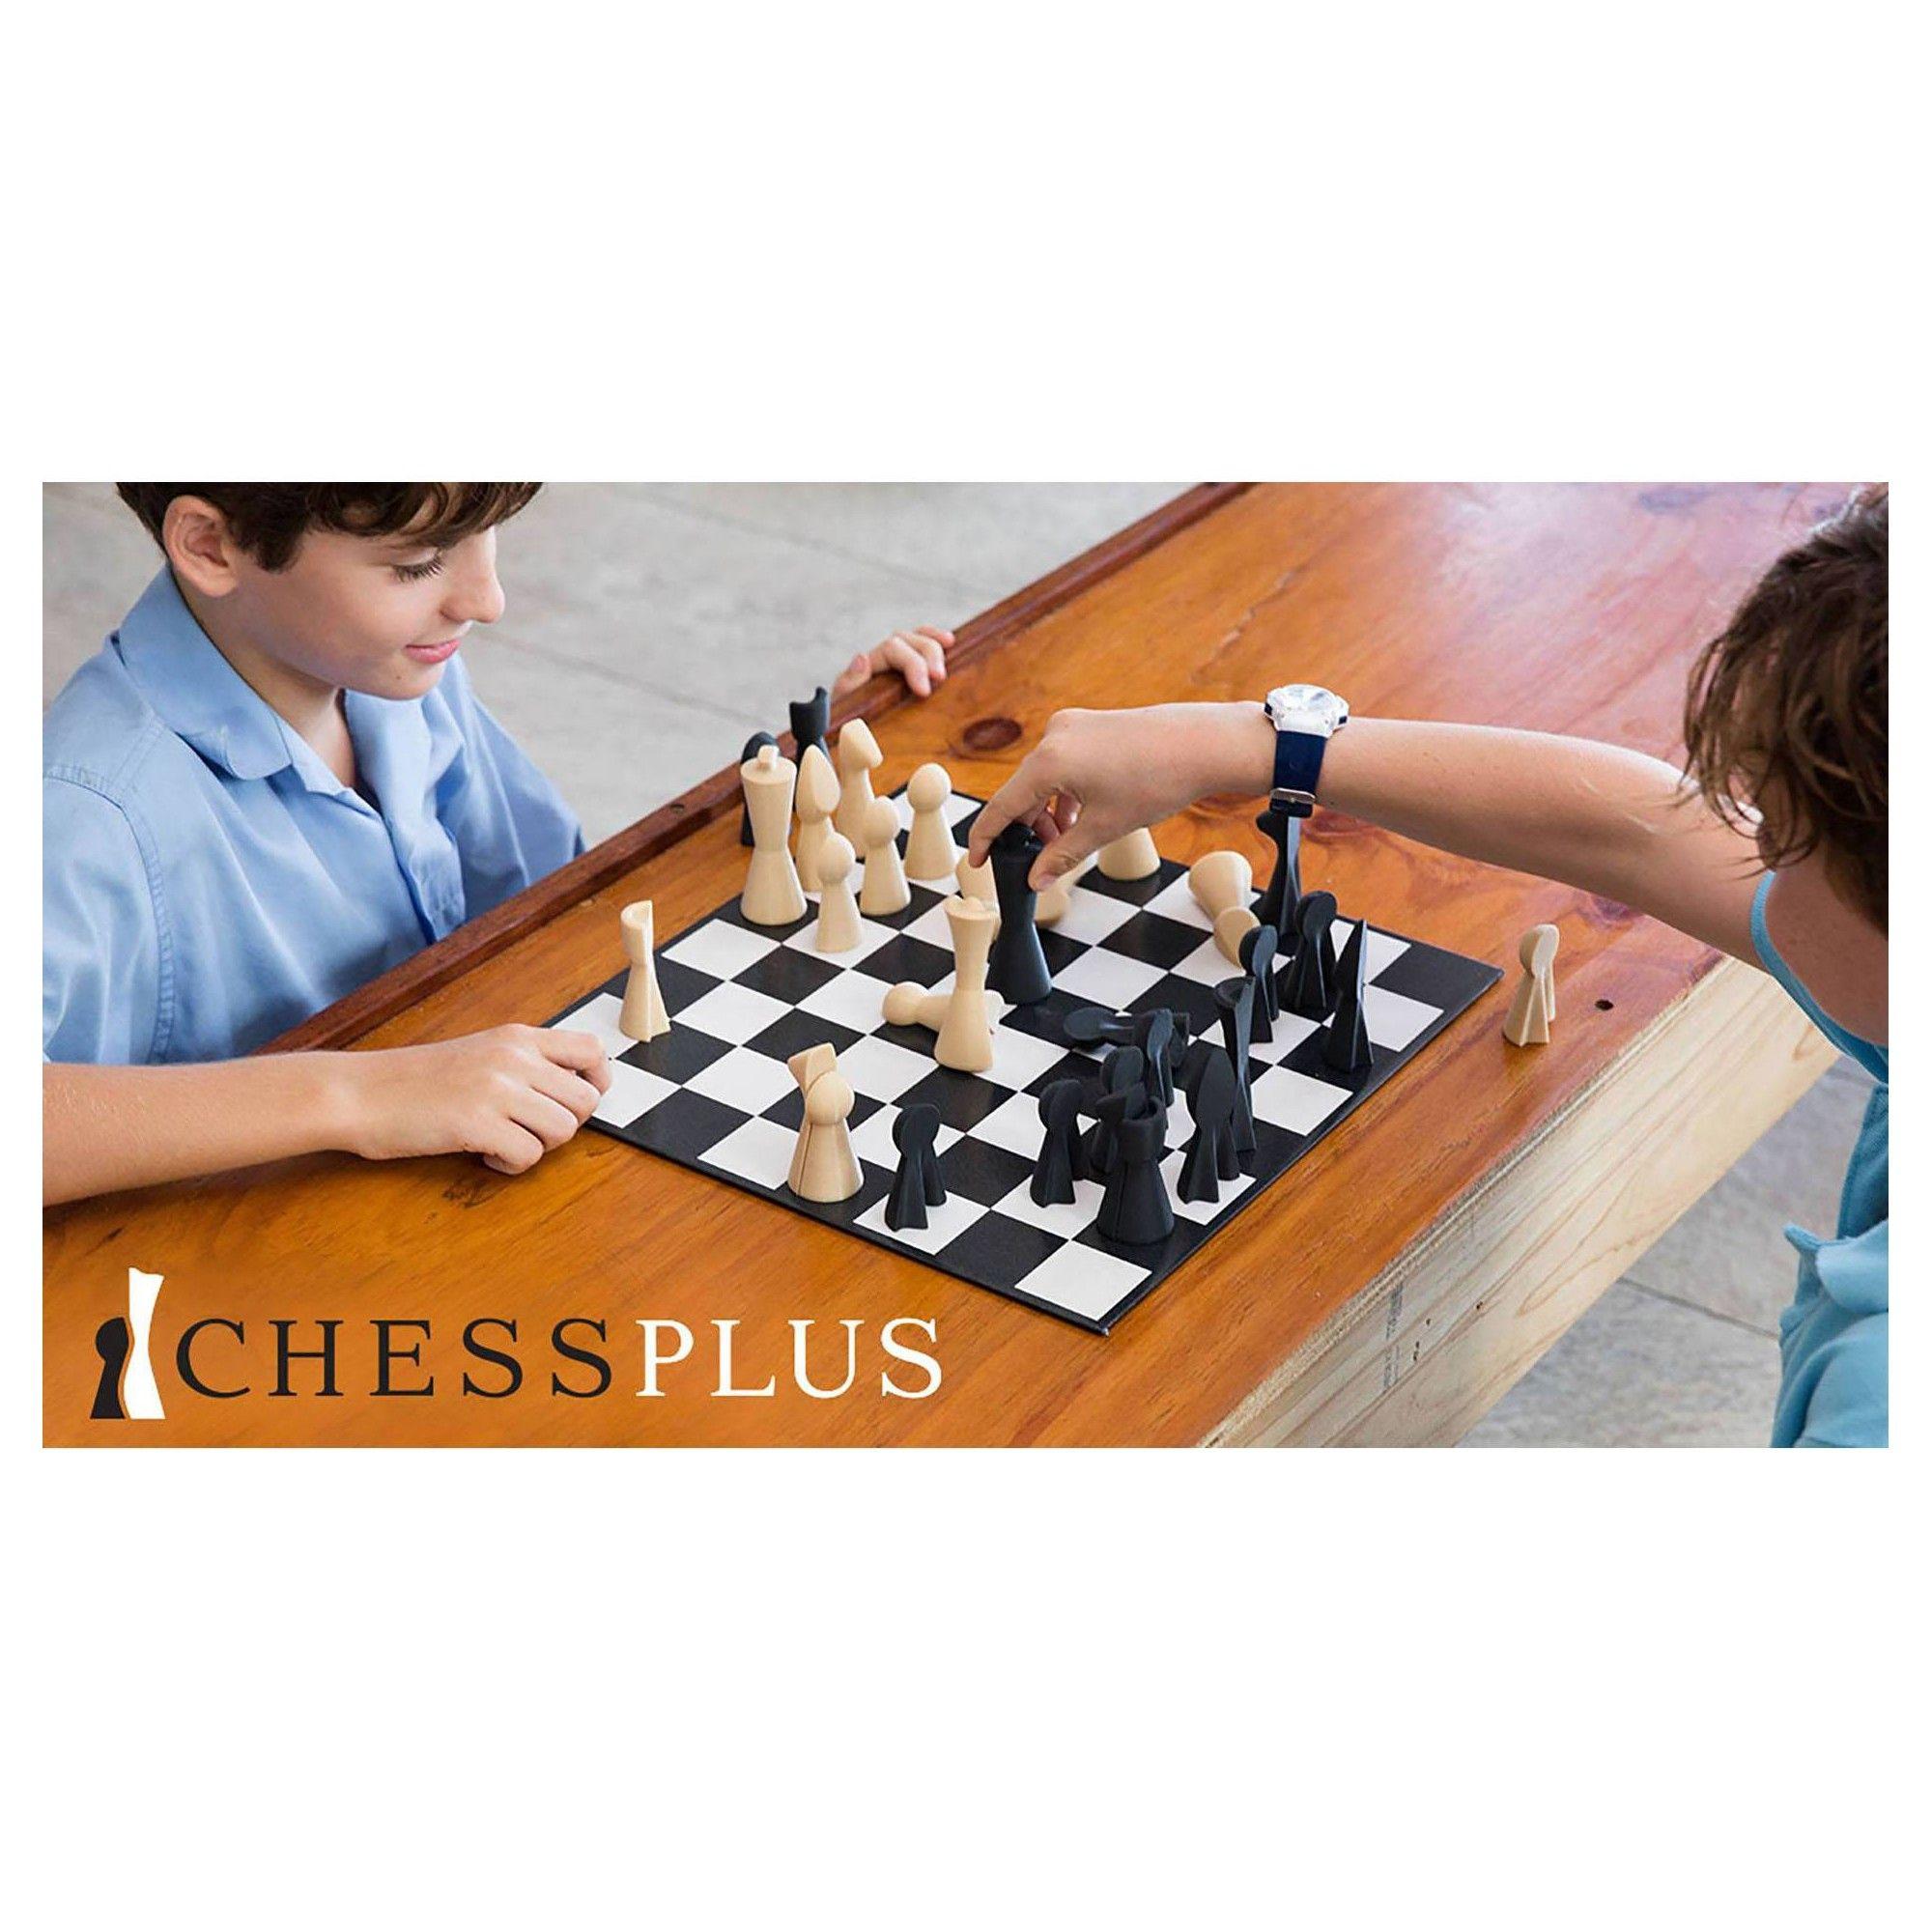 Chessplus Board Game, board games Board games, Board